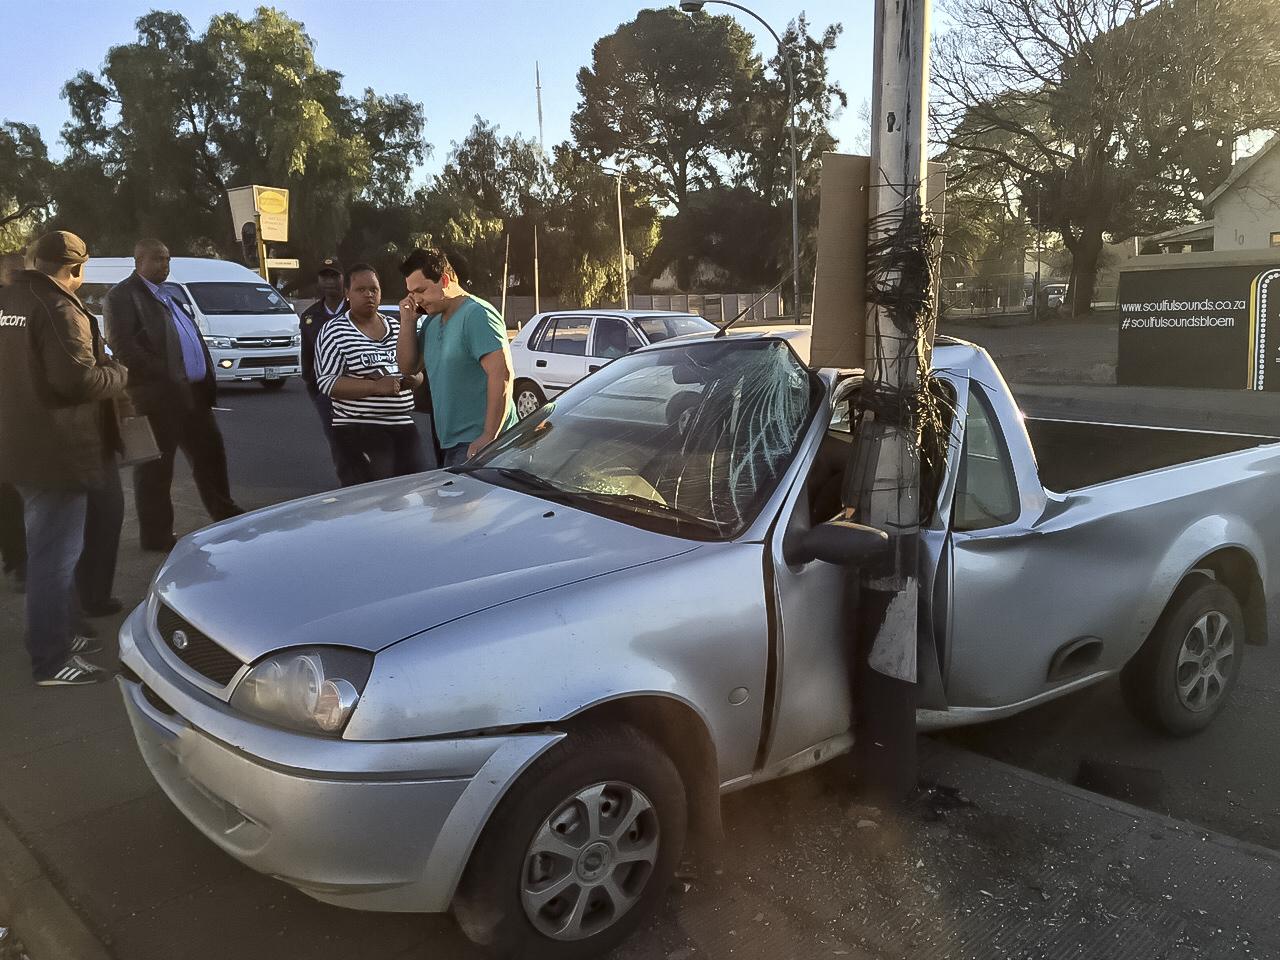 Bloemfontein road crash leaves one injured